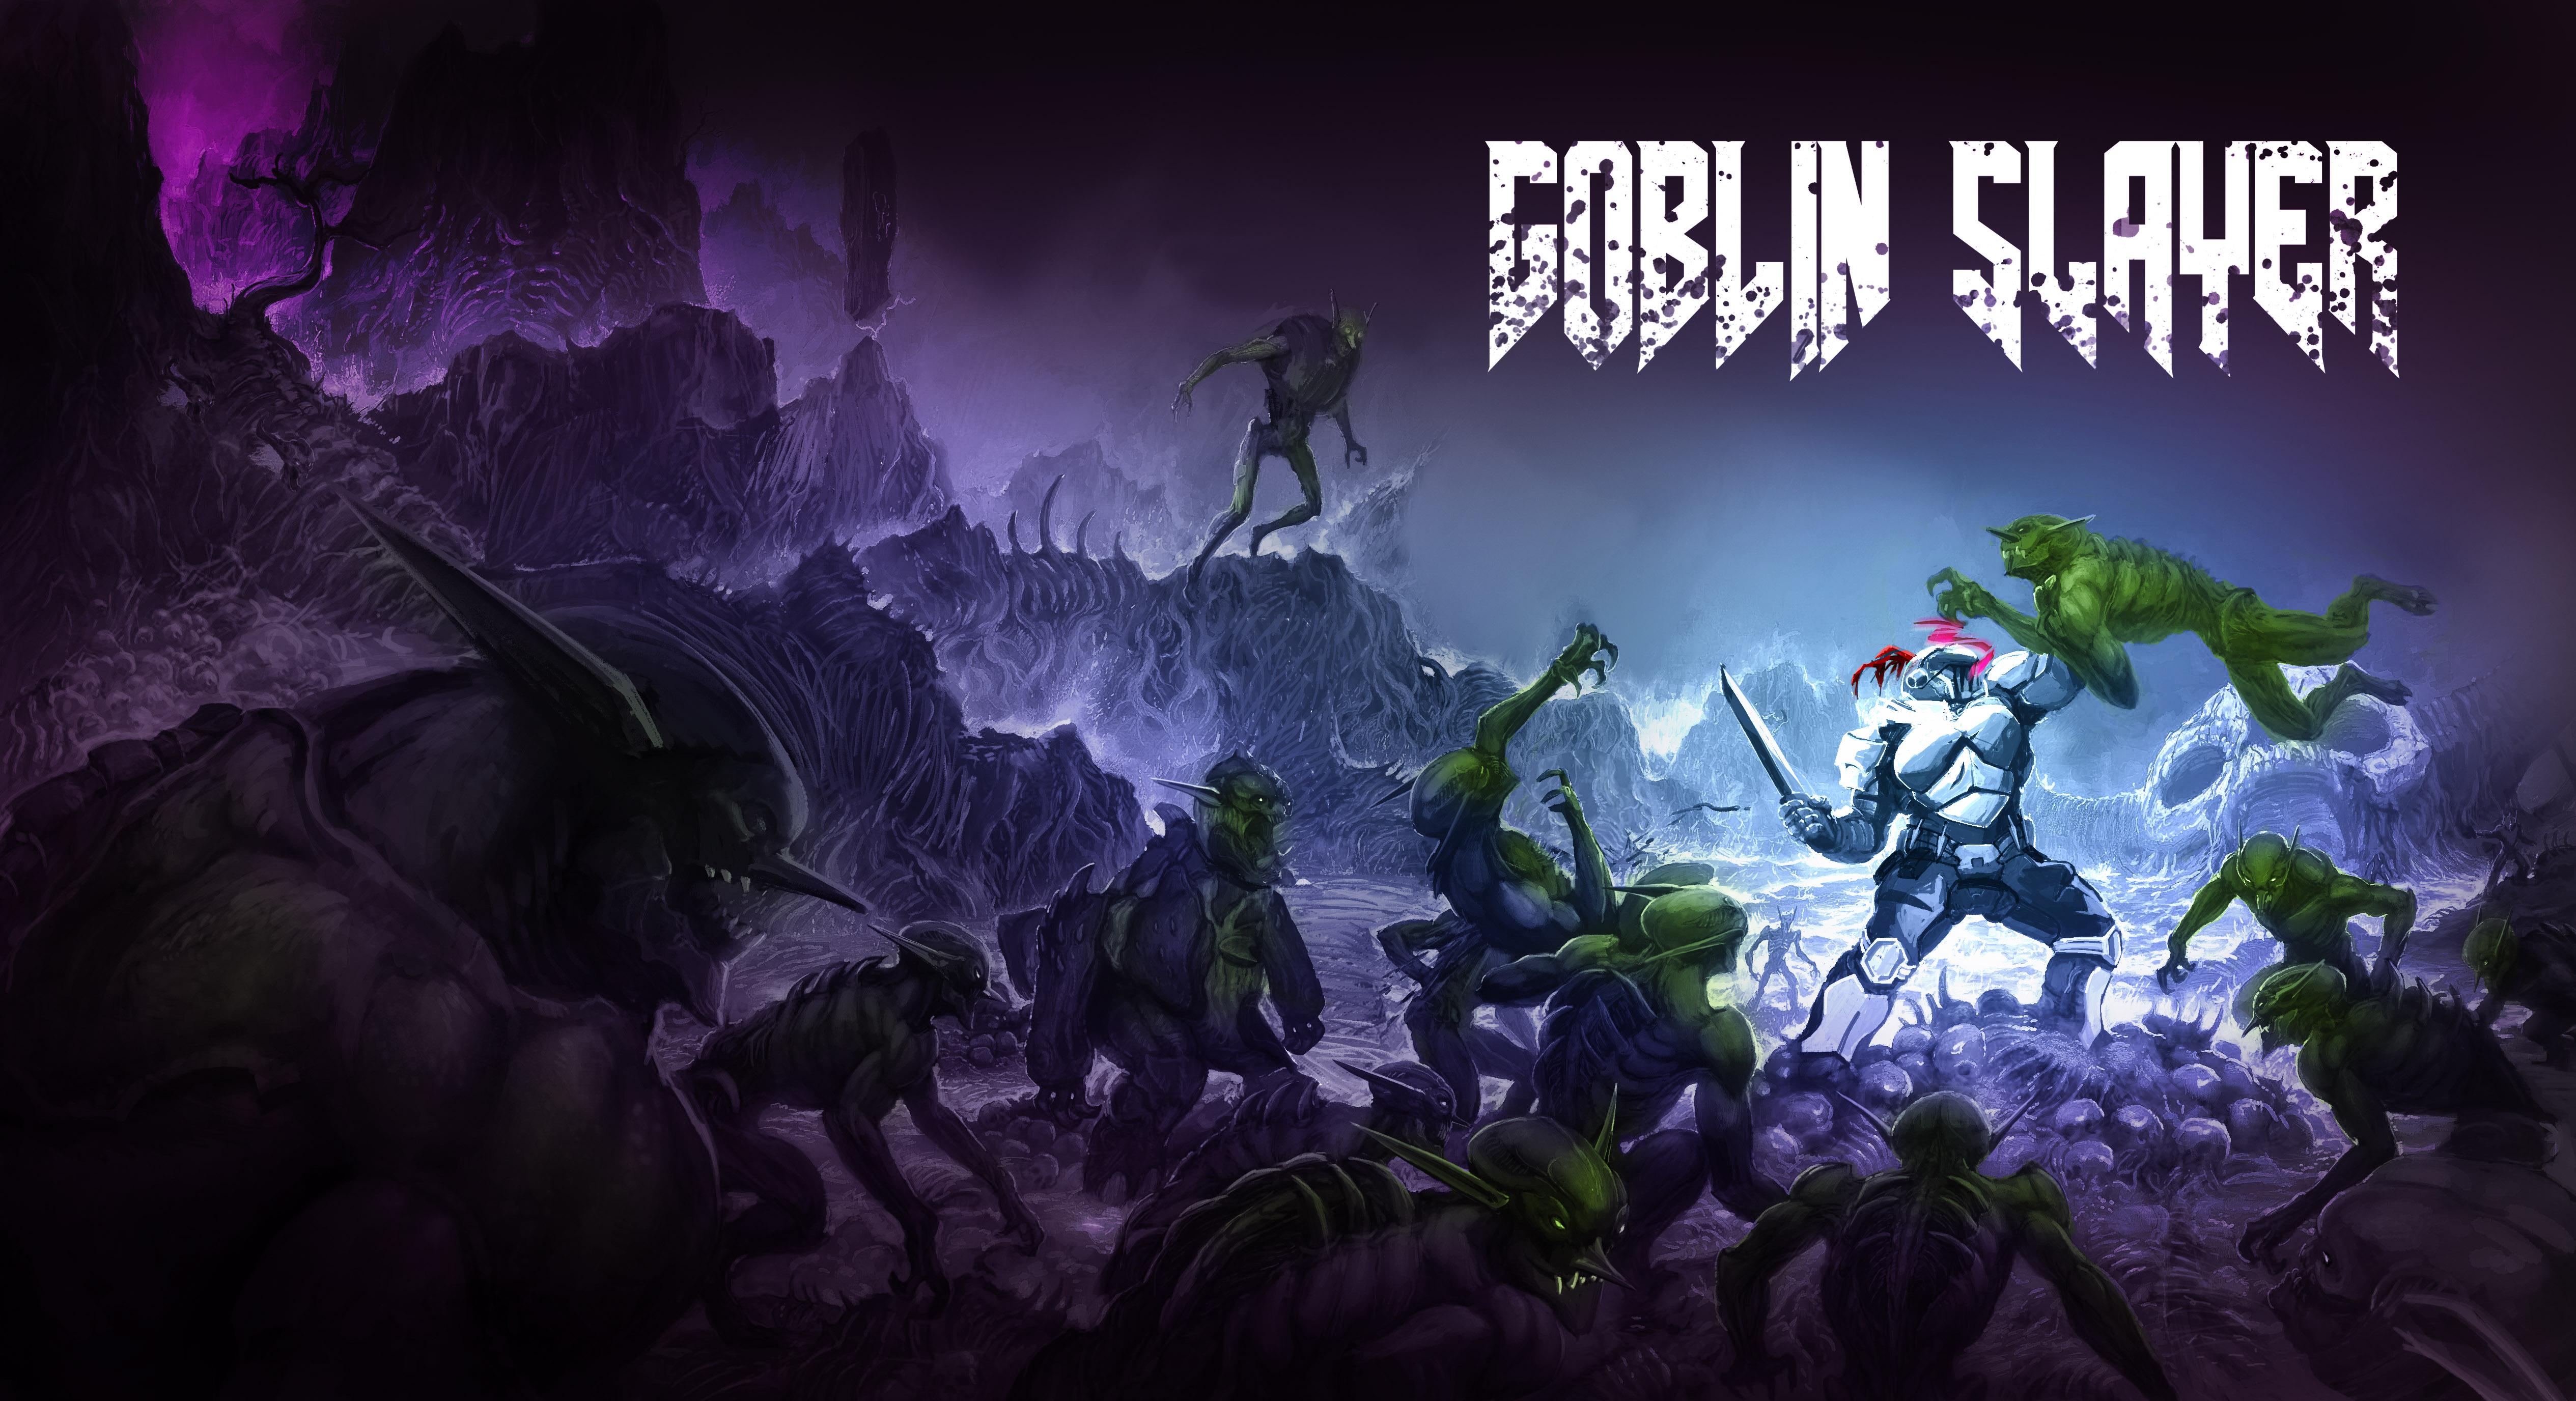 Wallpaper Doom Game Doom 2016 Video Game Art Crossover